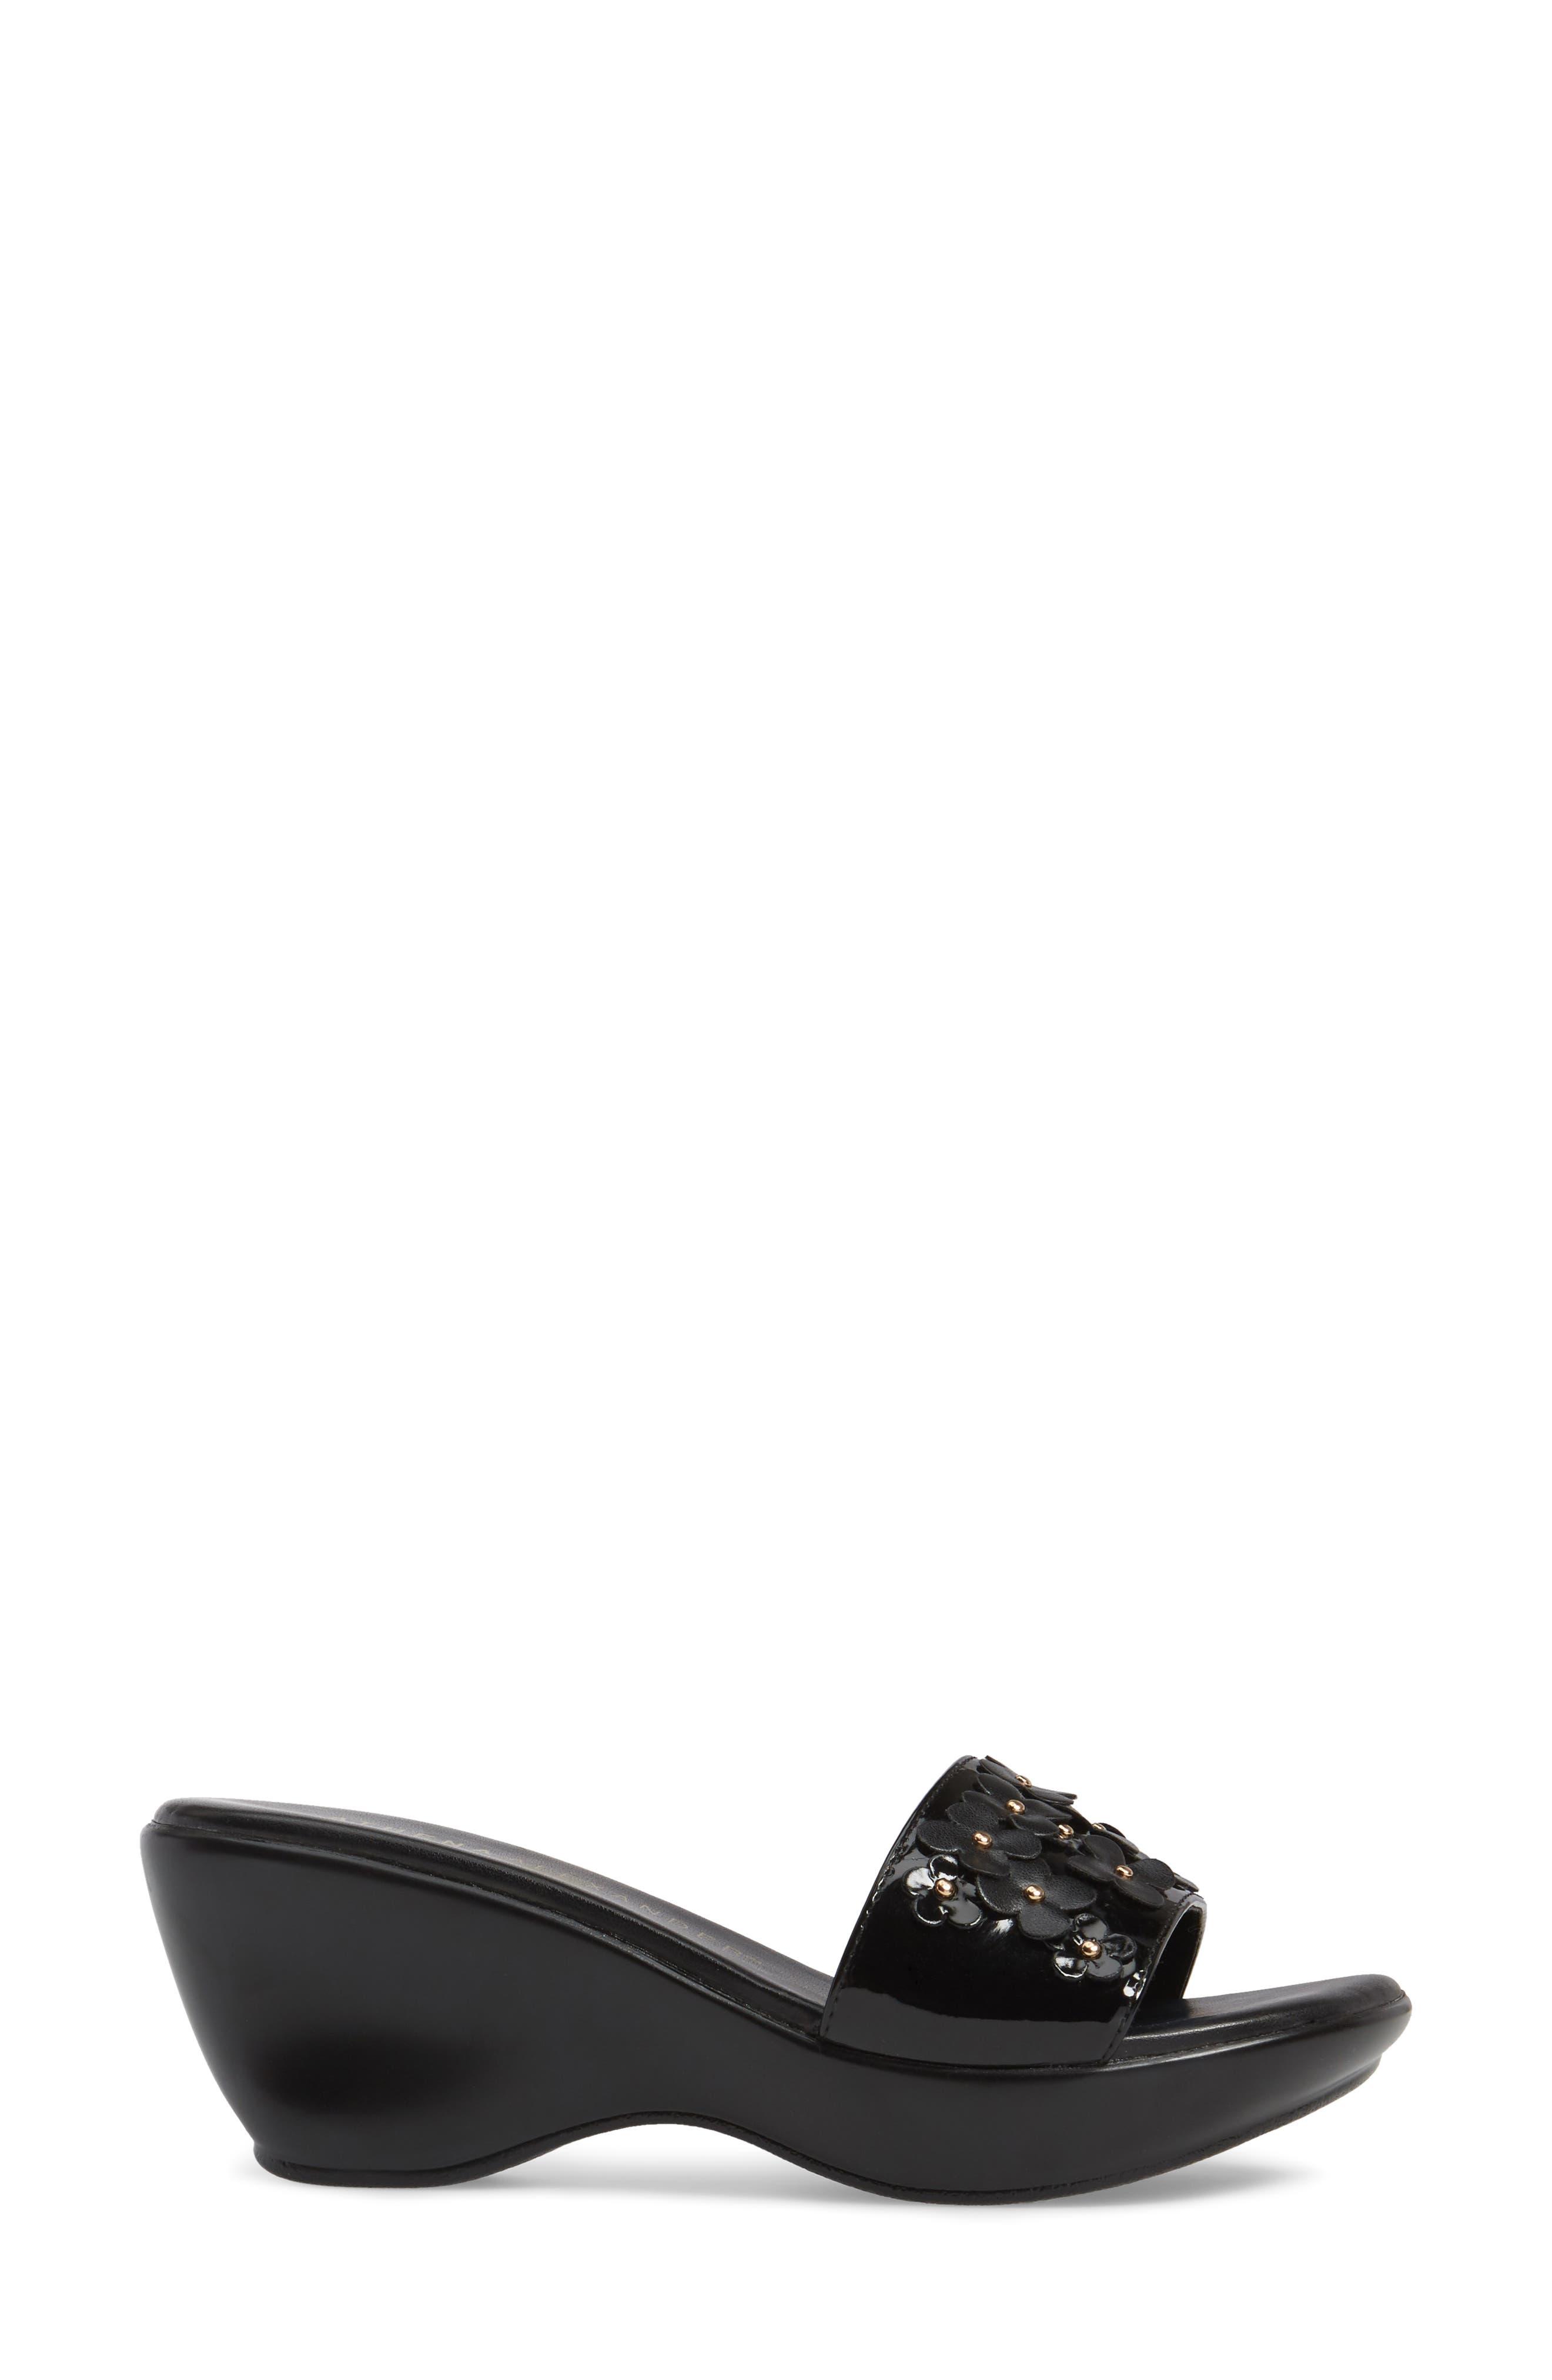 Allegra Wedge Slide,                             Alternate thumbnail 3, color,                             Black Faux Leather